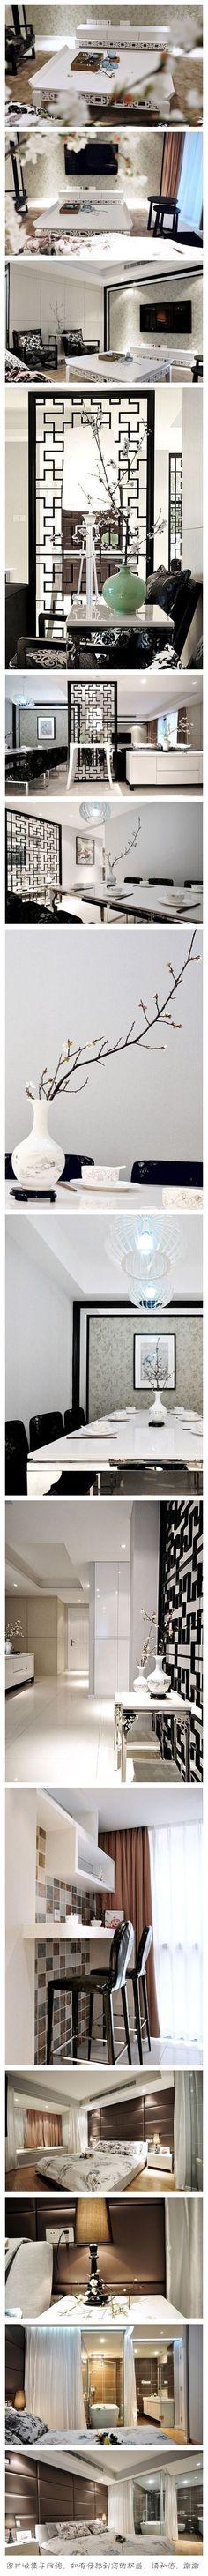 Chinese Tradition/modern interior http://www.pinterest.com/joliesarts ∗  »☆Elysian-Interiors ♕ Simply Divine #Interiordesign